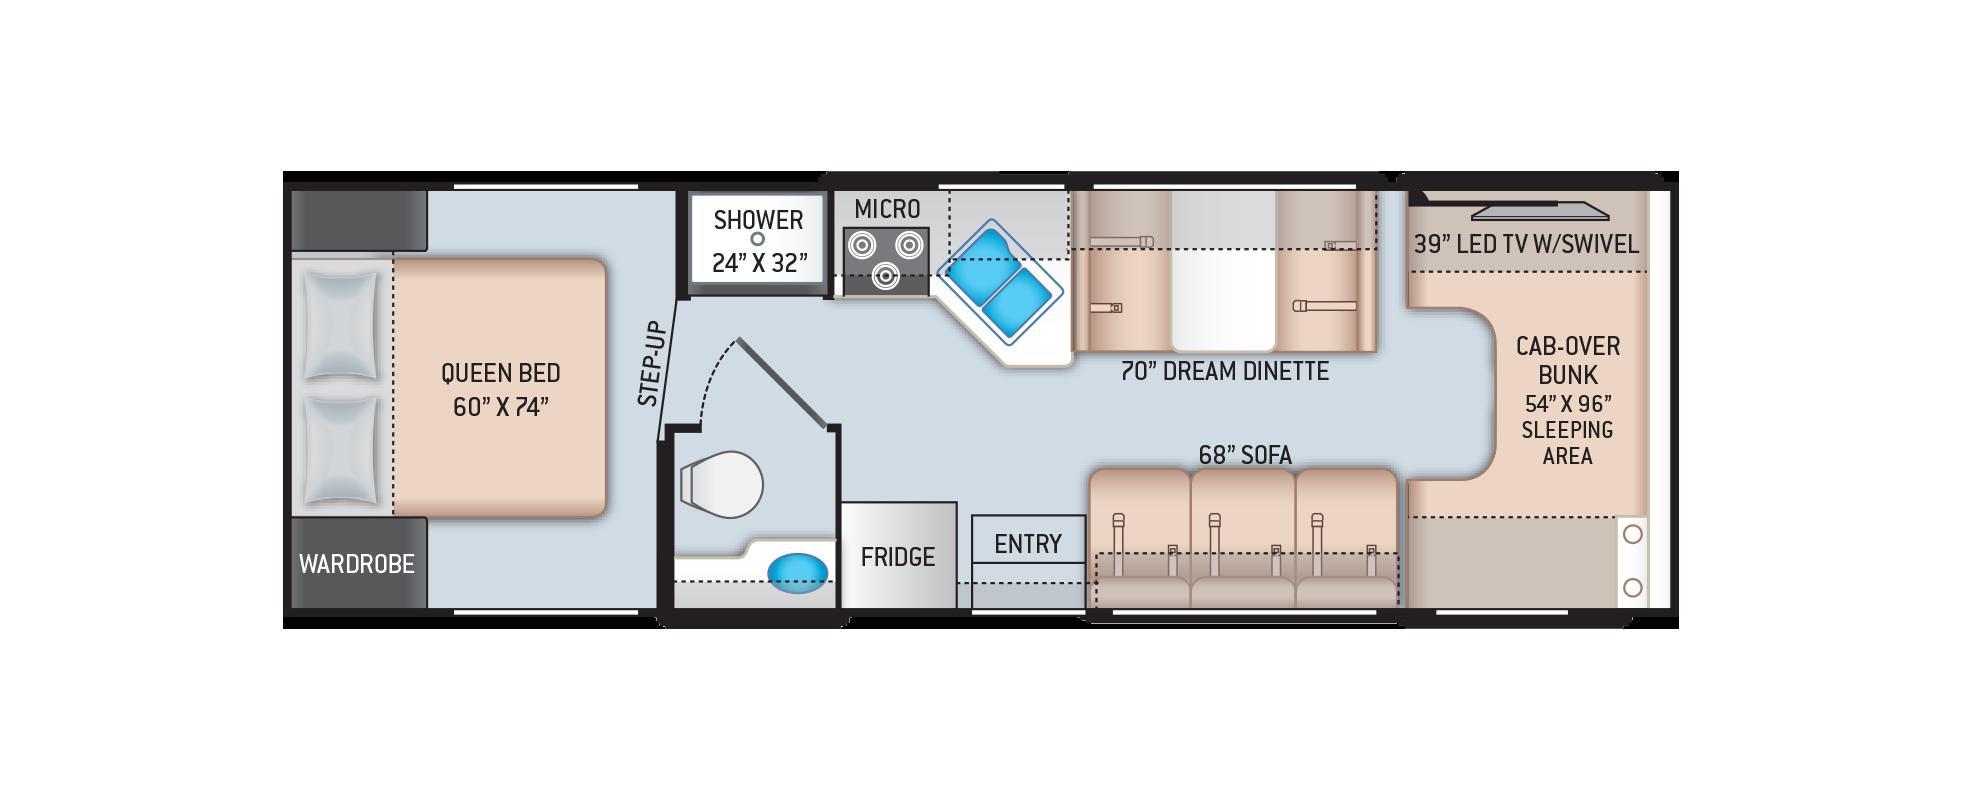 Chateau Class C Motorhome 28A Floor Plan